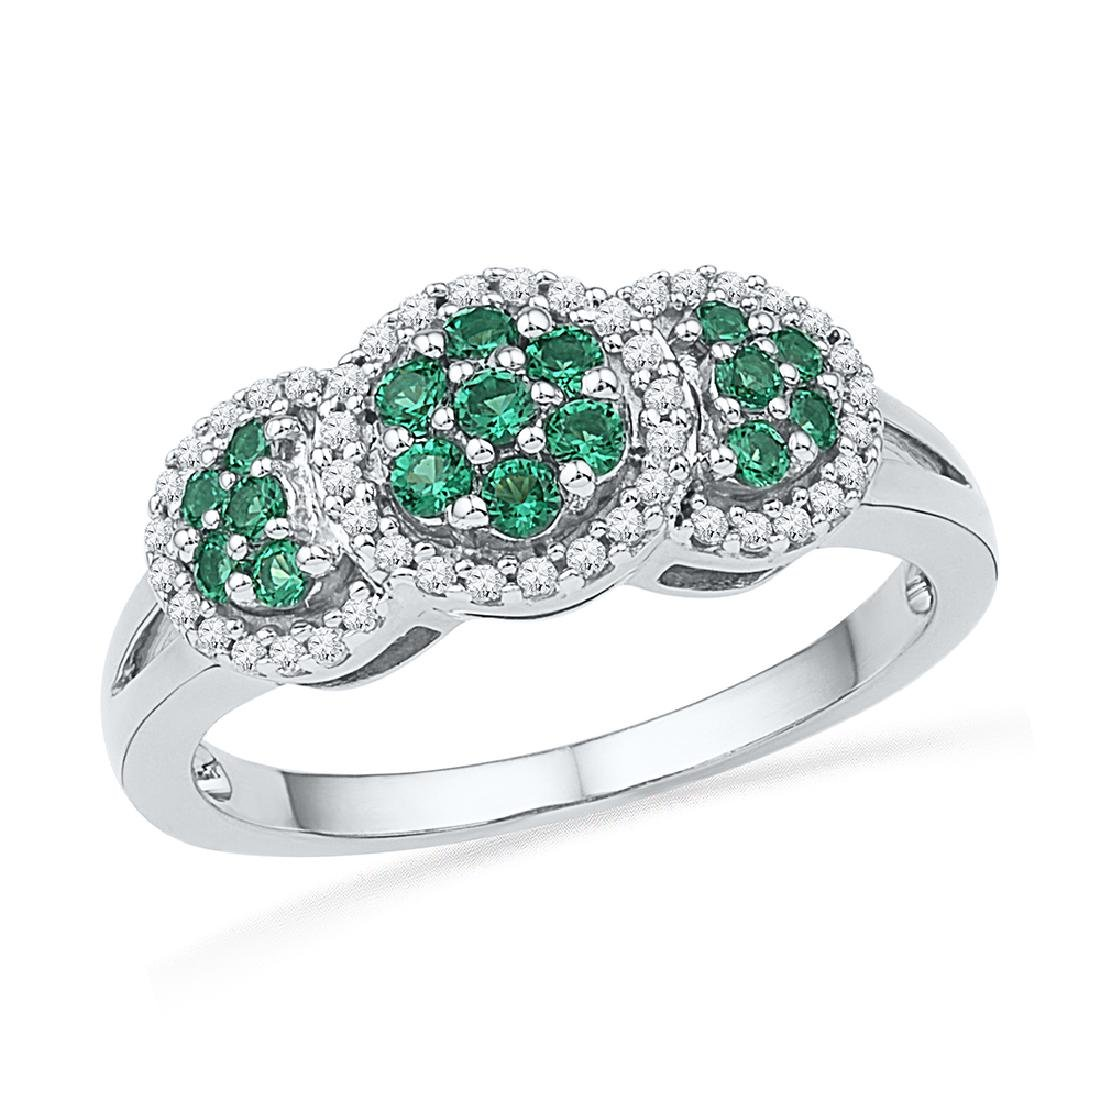 0.43 CTW Created Emerald Diamond Cluster Ring 10KT